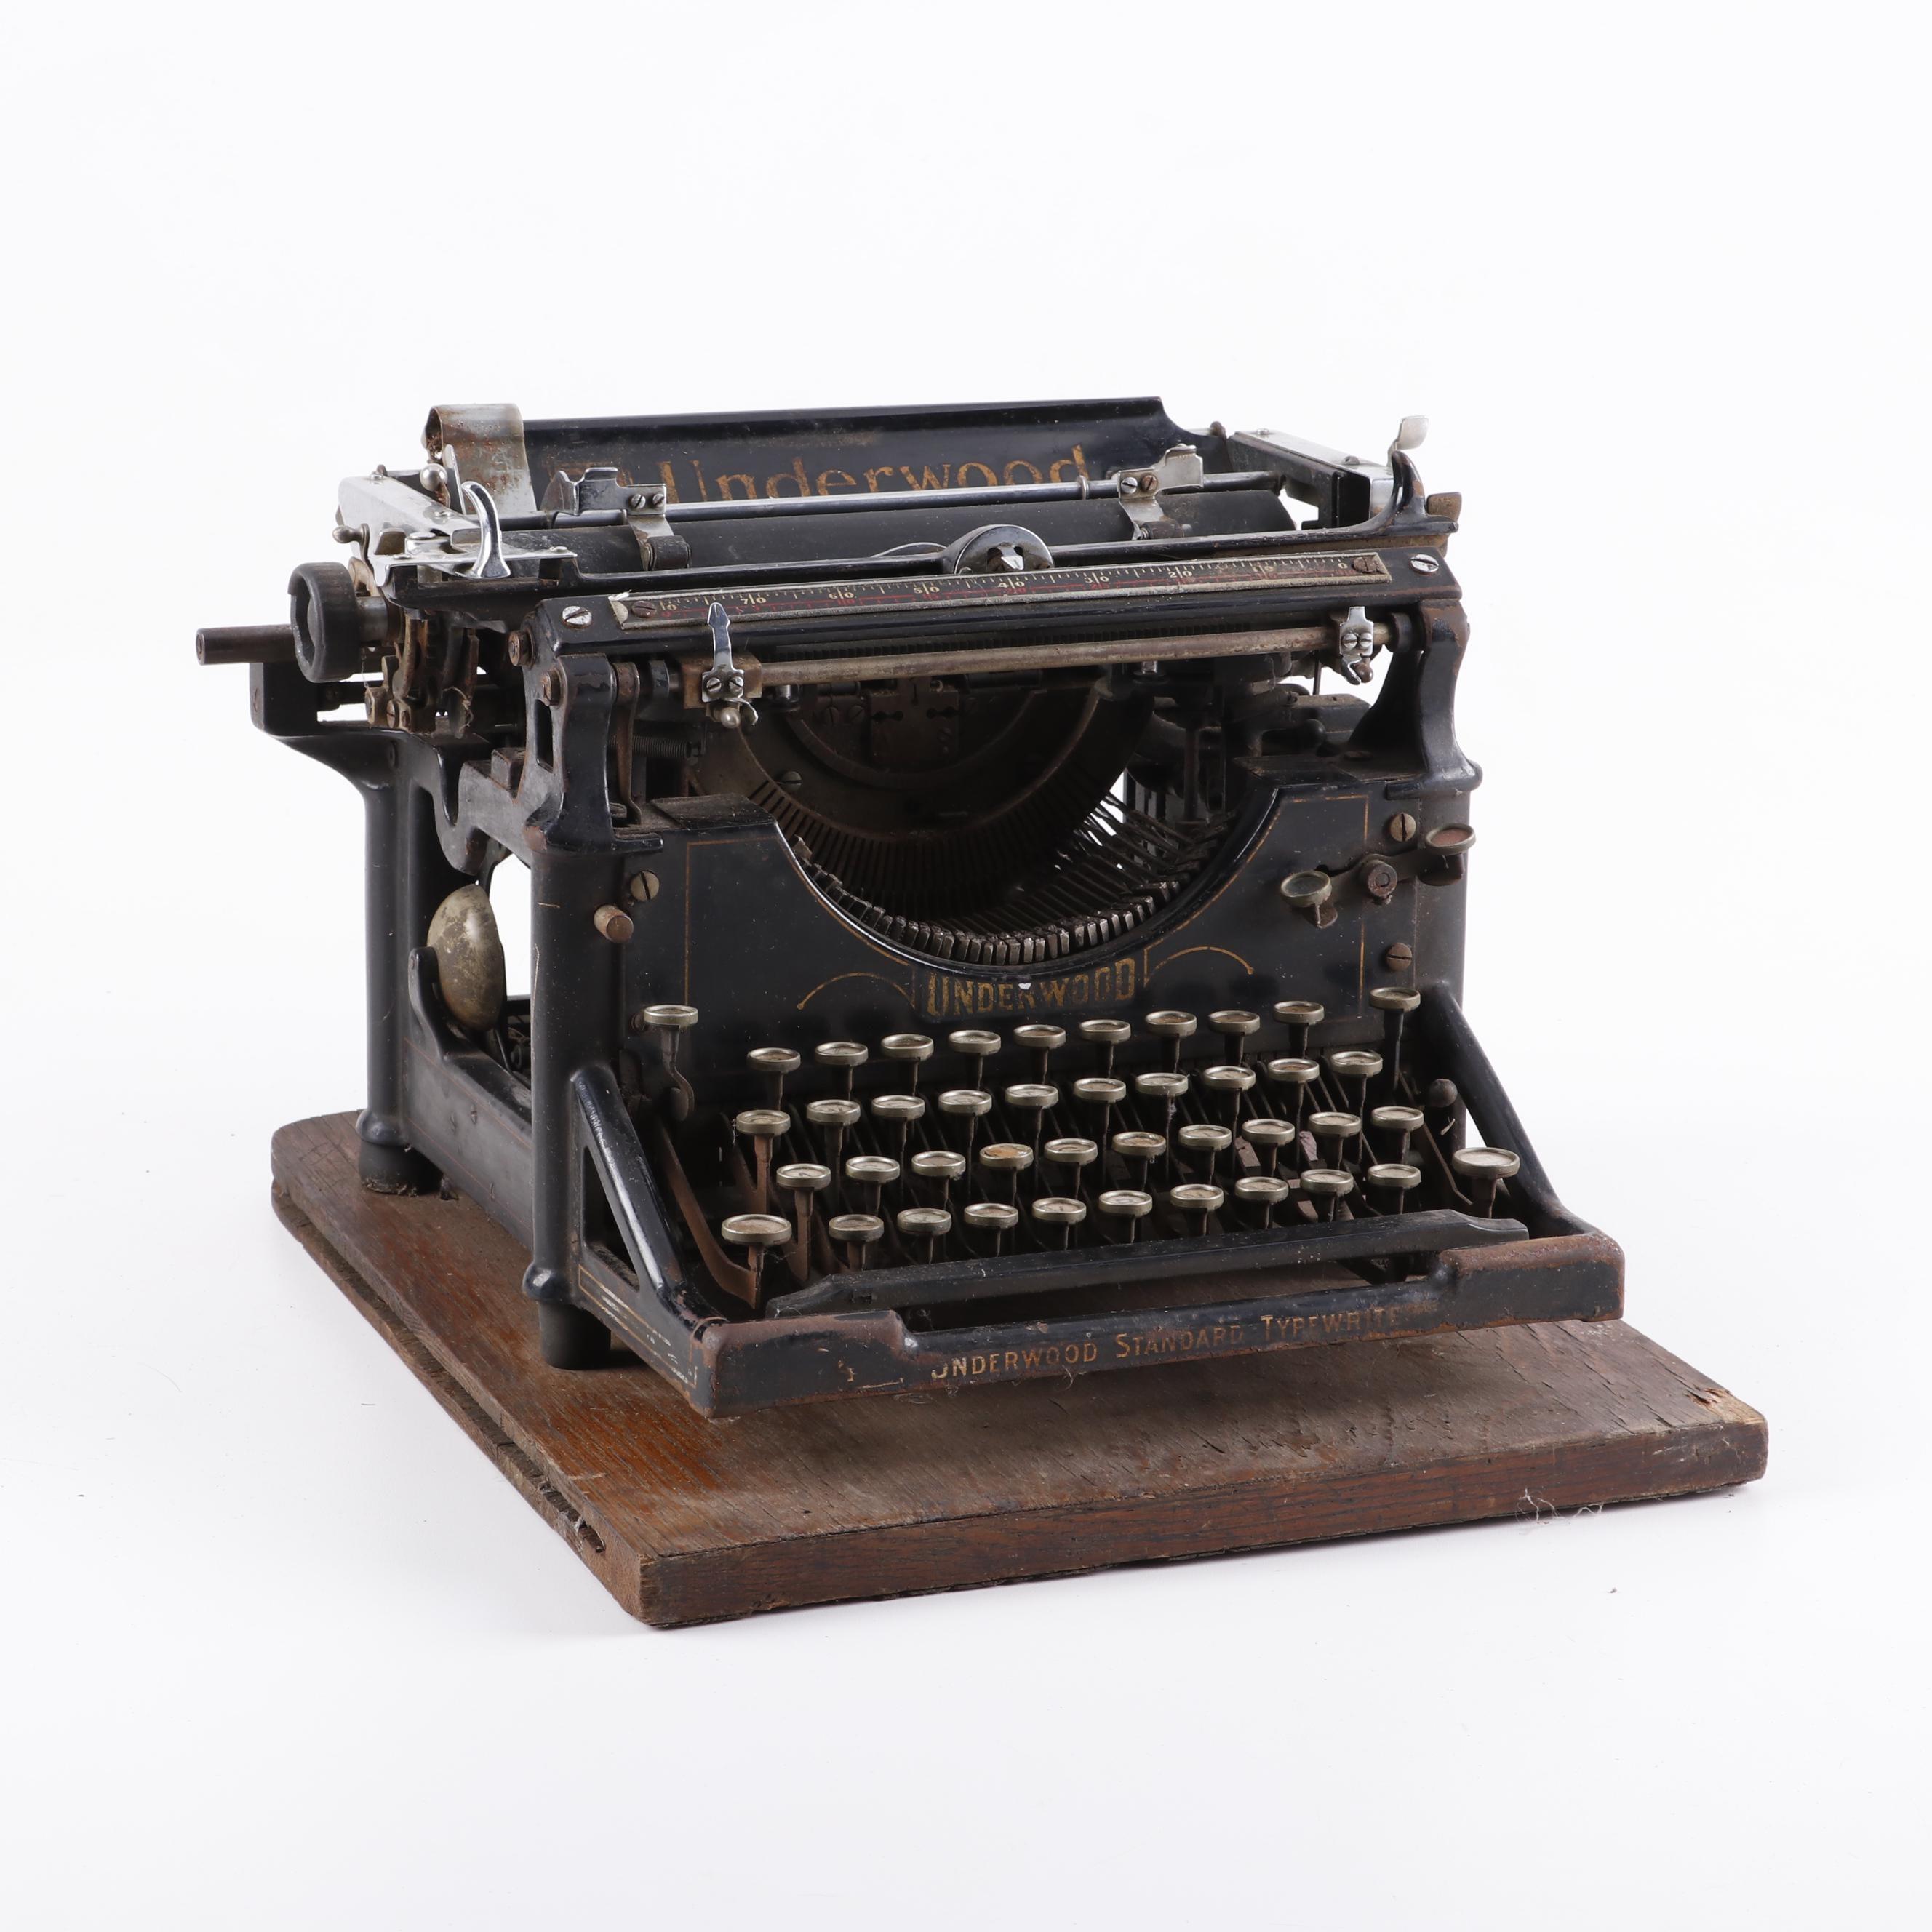 Underwood Vintage Typewriter, Early 20th Century